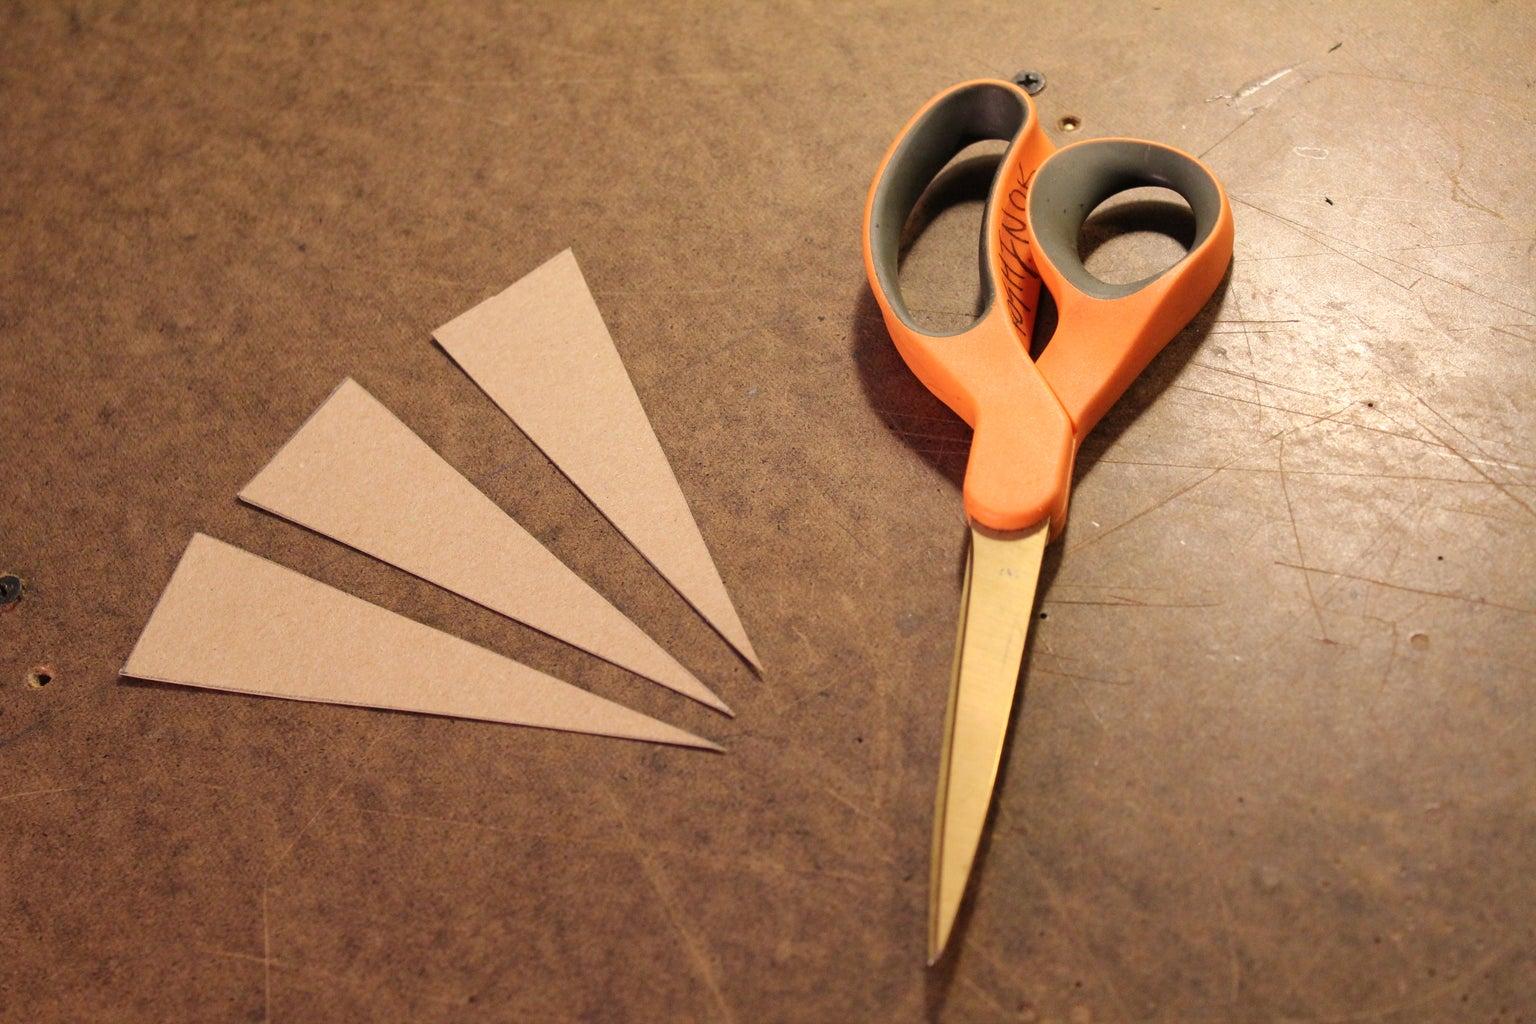 Fletching the Arrow